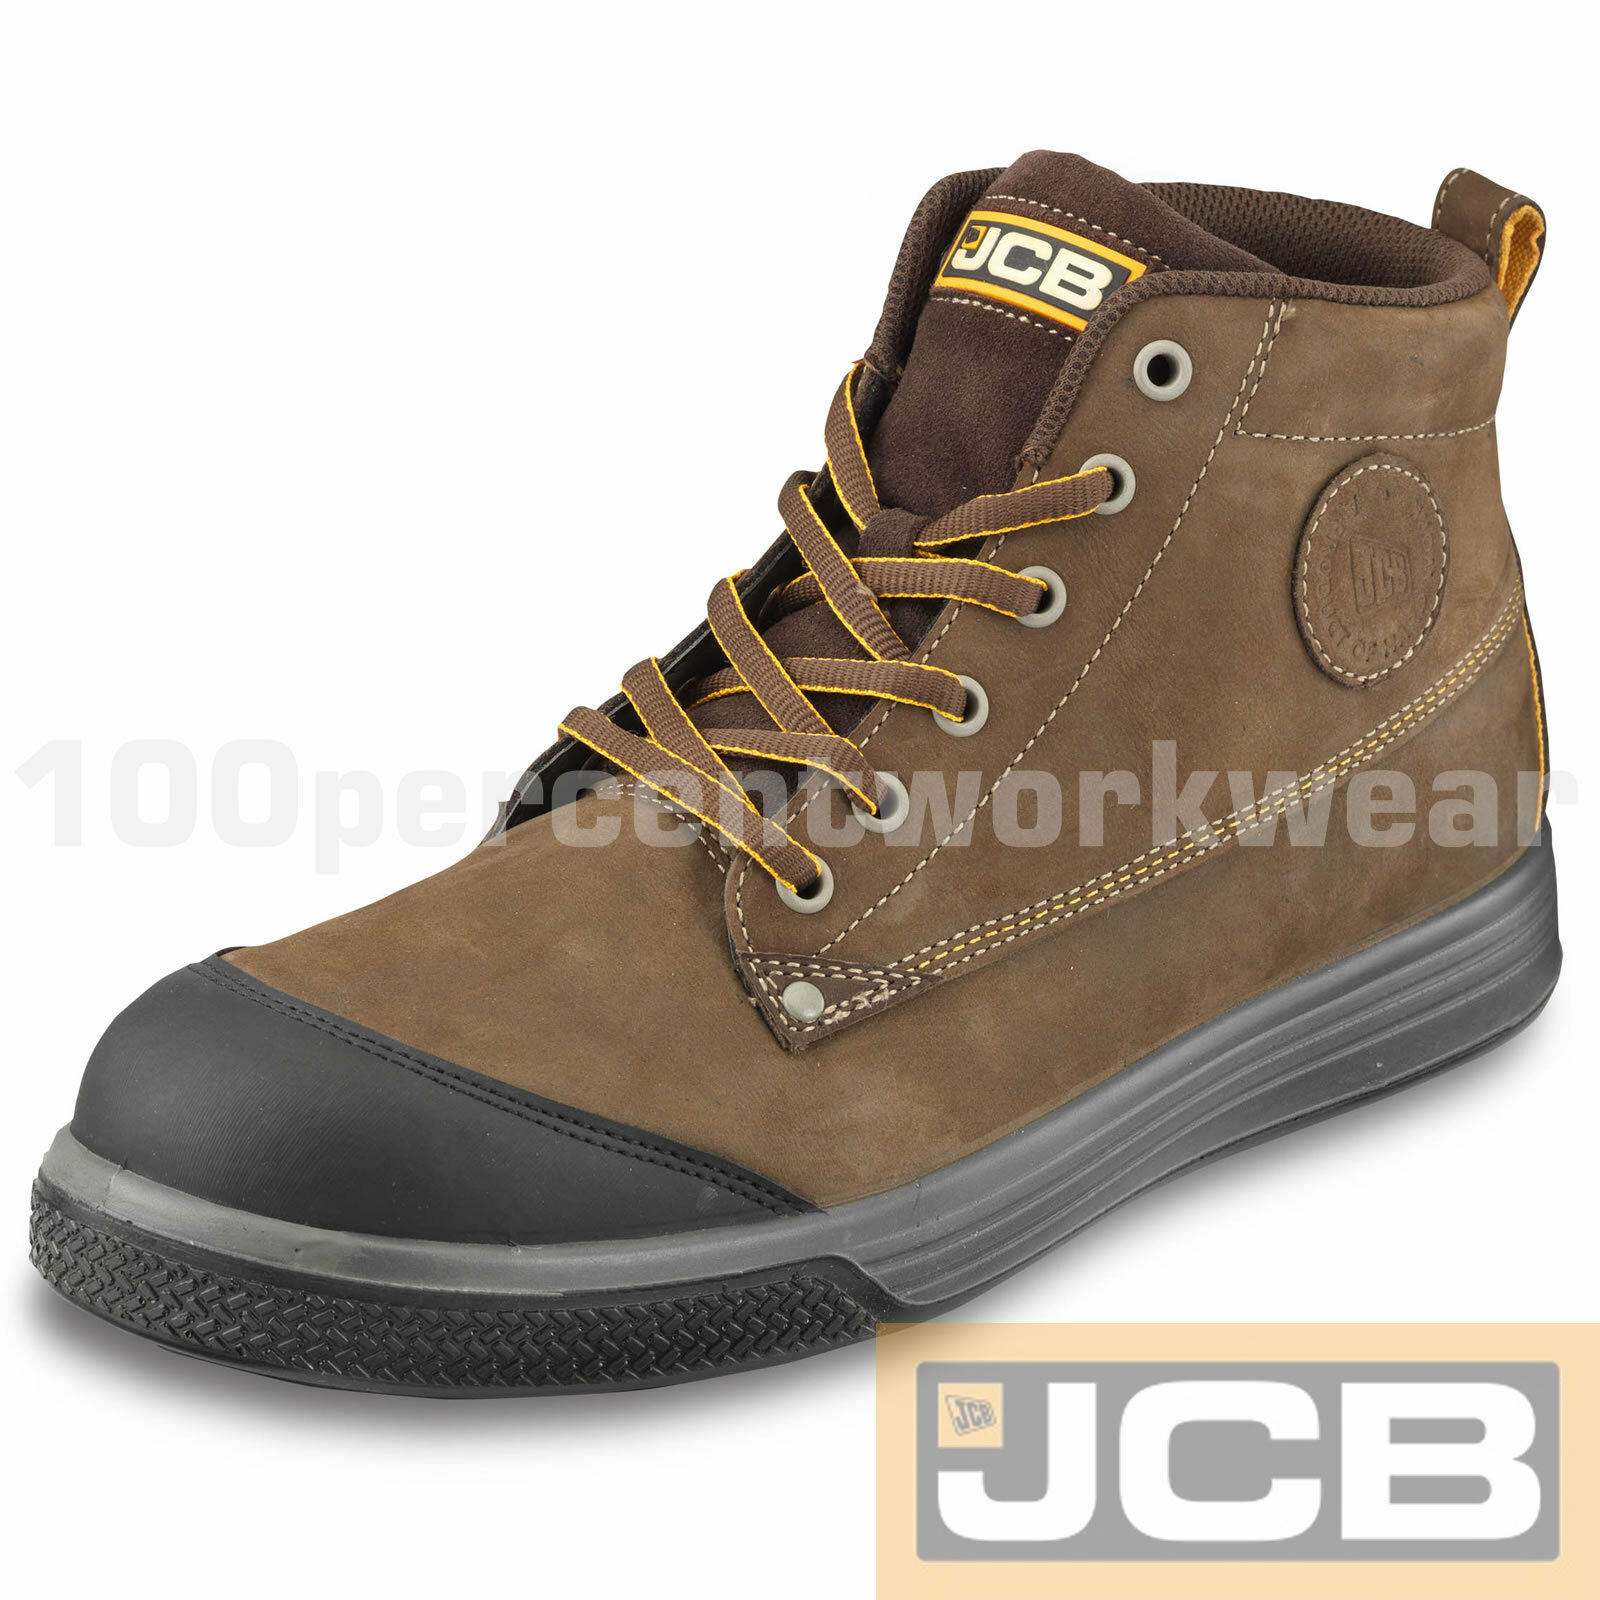 JCB 4CX BROWN Safety Leder S3 Work Trainers Cap Stiefel Baseball Composite Toe Cap Trainers e1ecb3